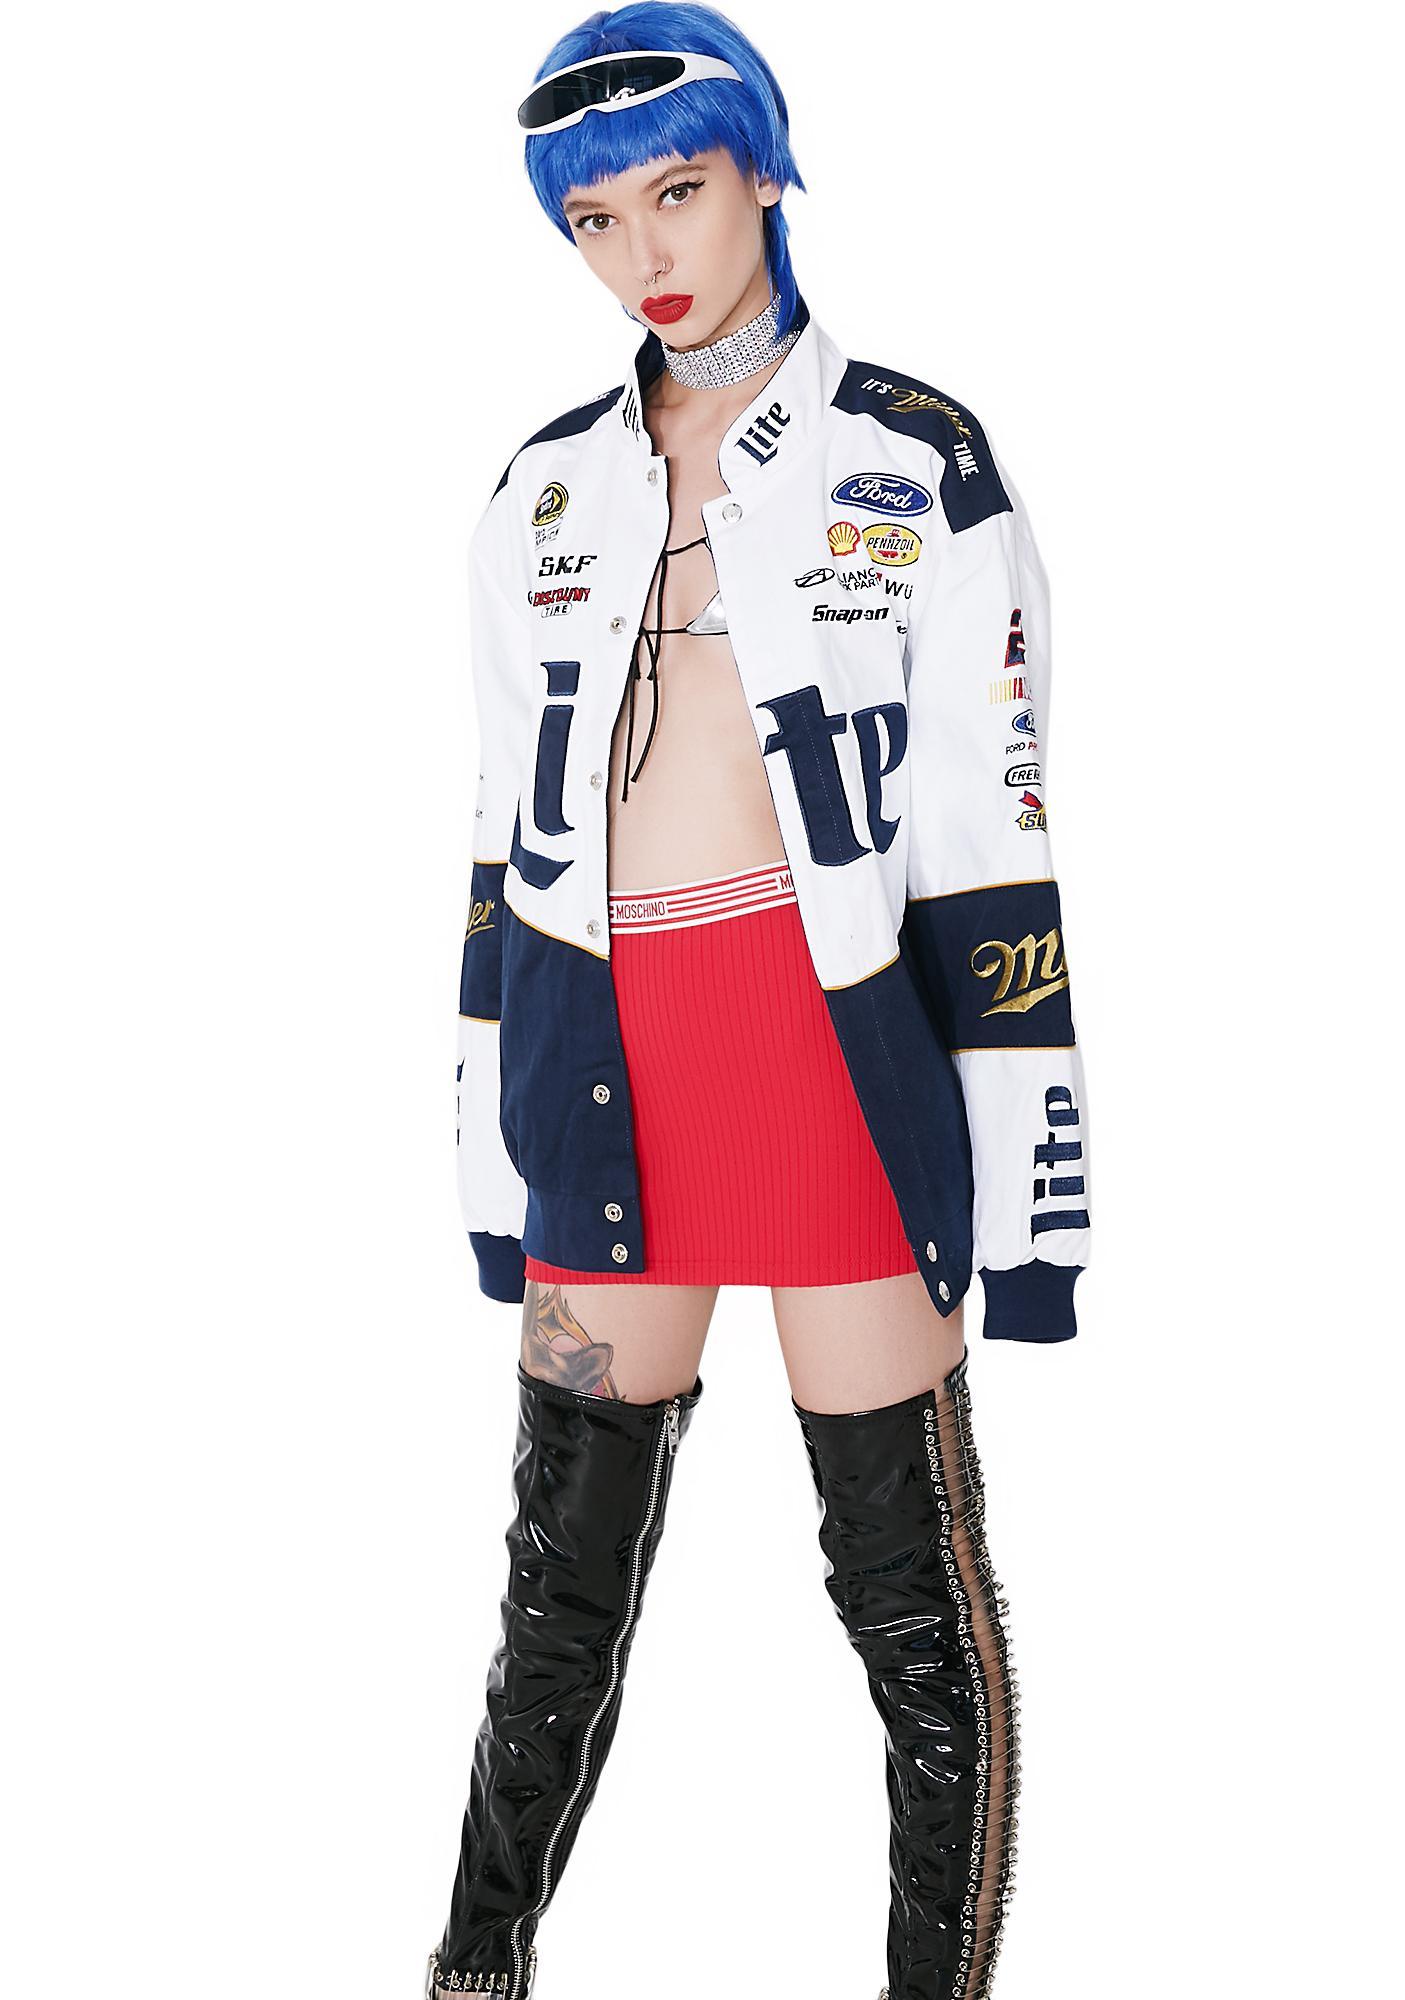 Brad Keselowski Miller Lite NASCAR Twill Jacket